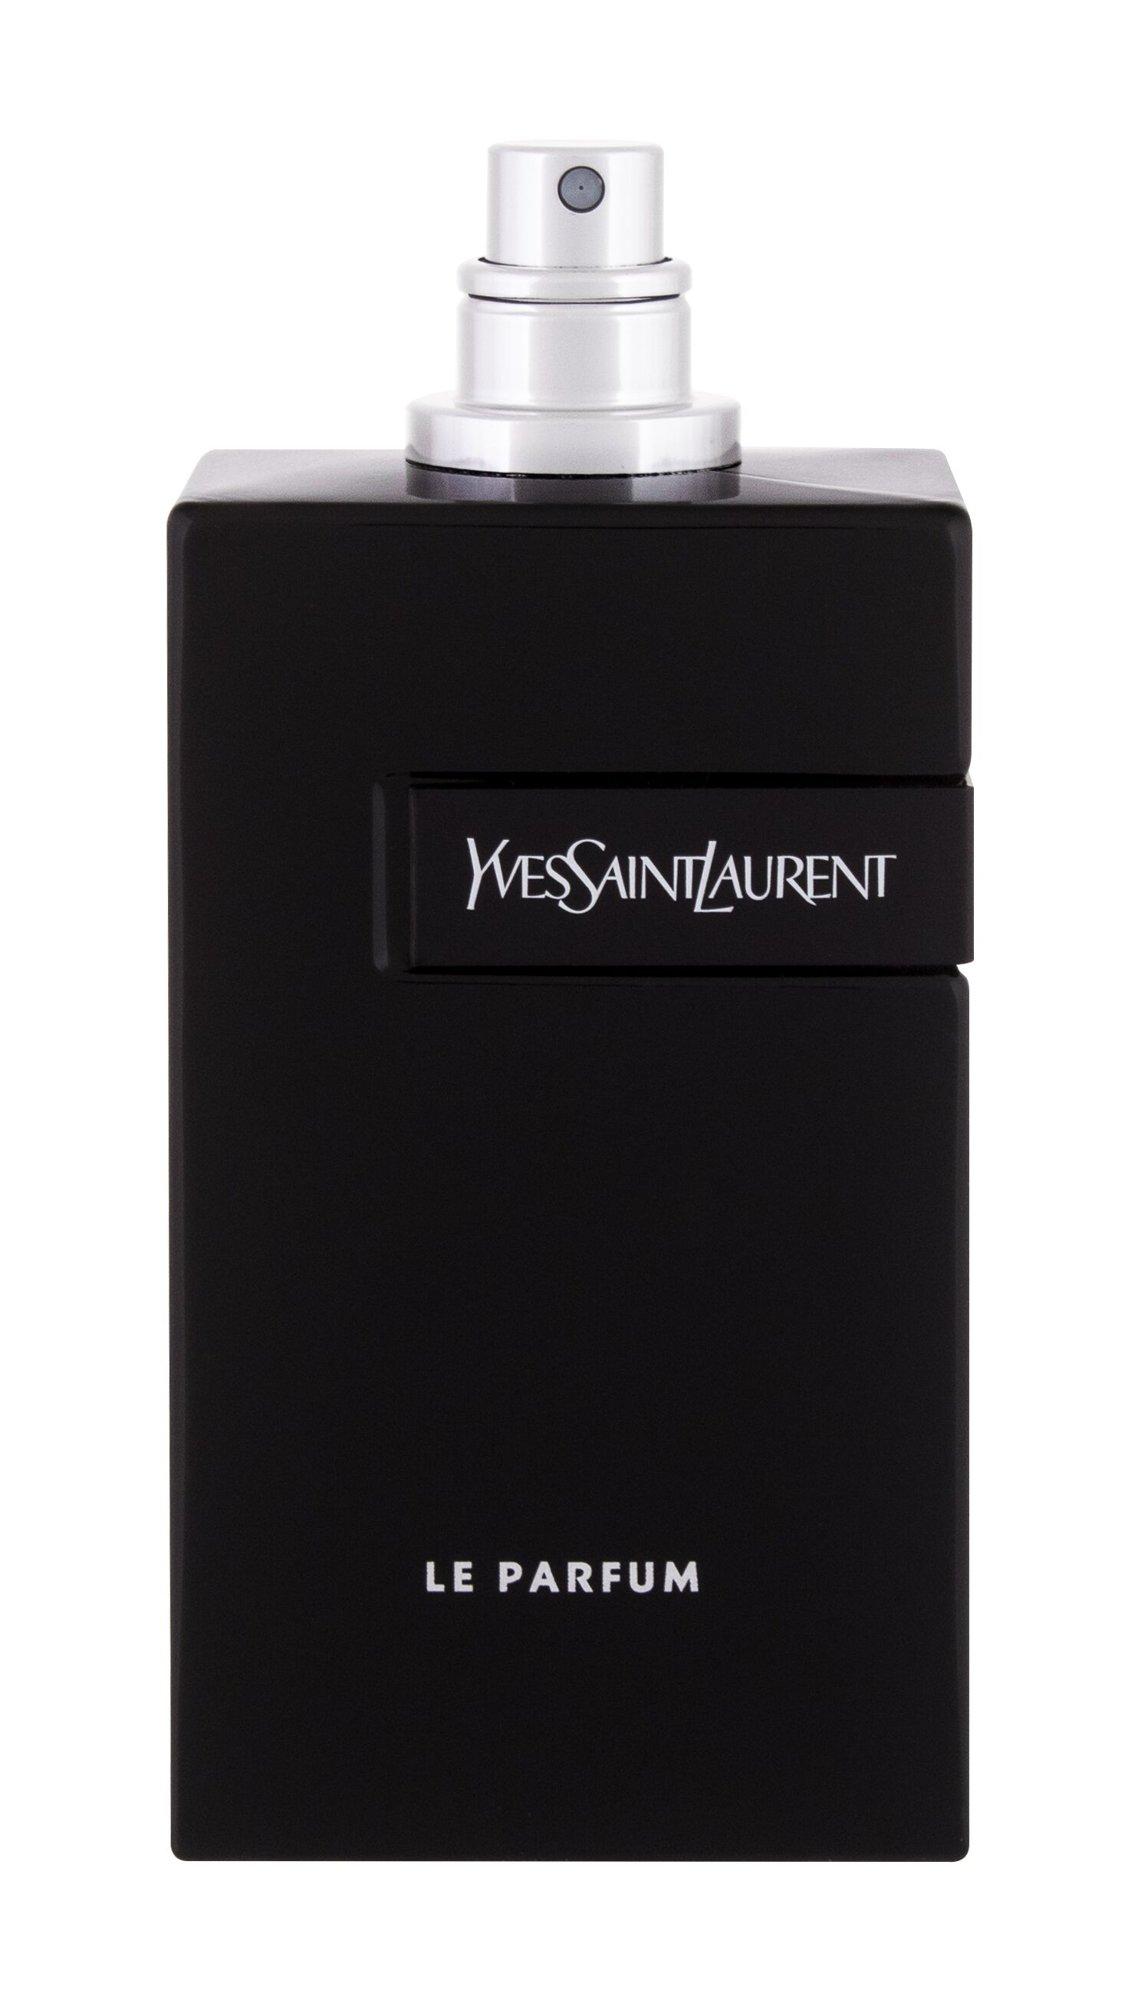 Yves Saint Laurent Y Le Parfum, Parfumovaná voda 100ml, Tester